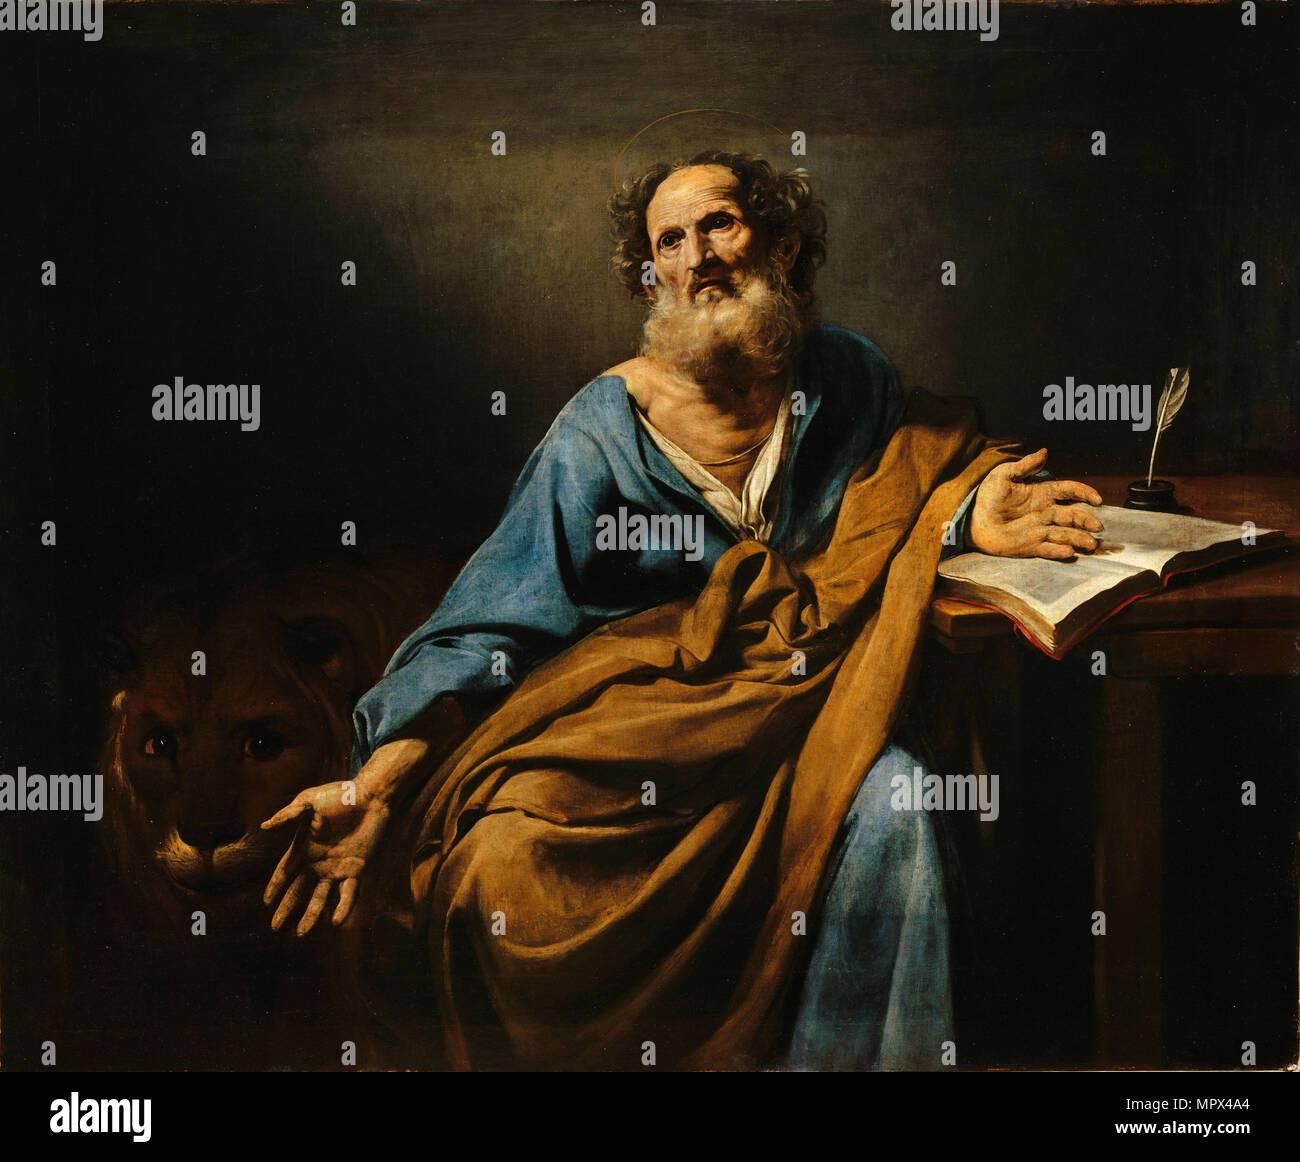 Saint Mark the Evangelist, ca 1624-1625. - Stock Image